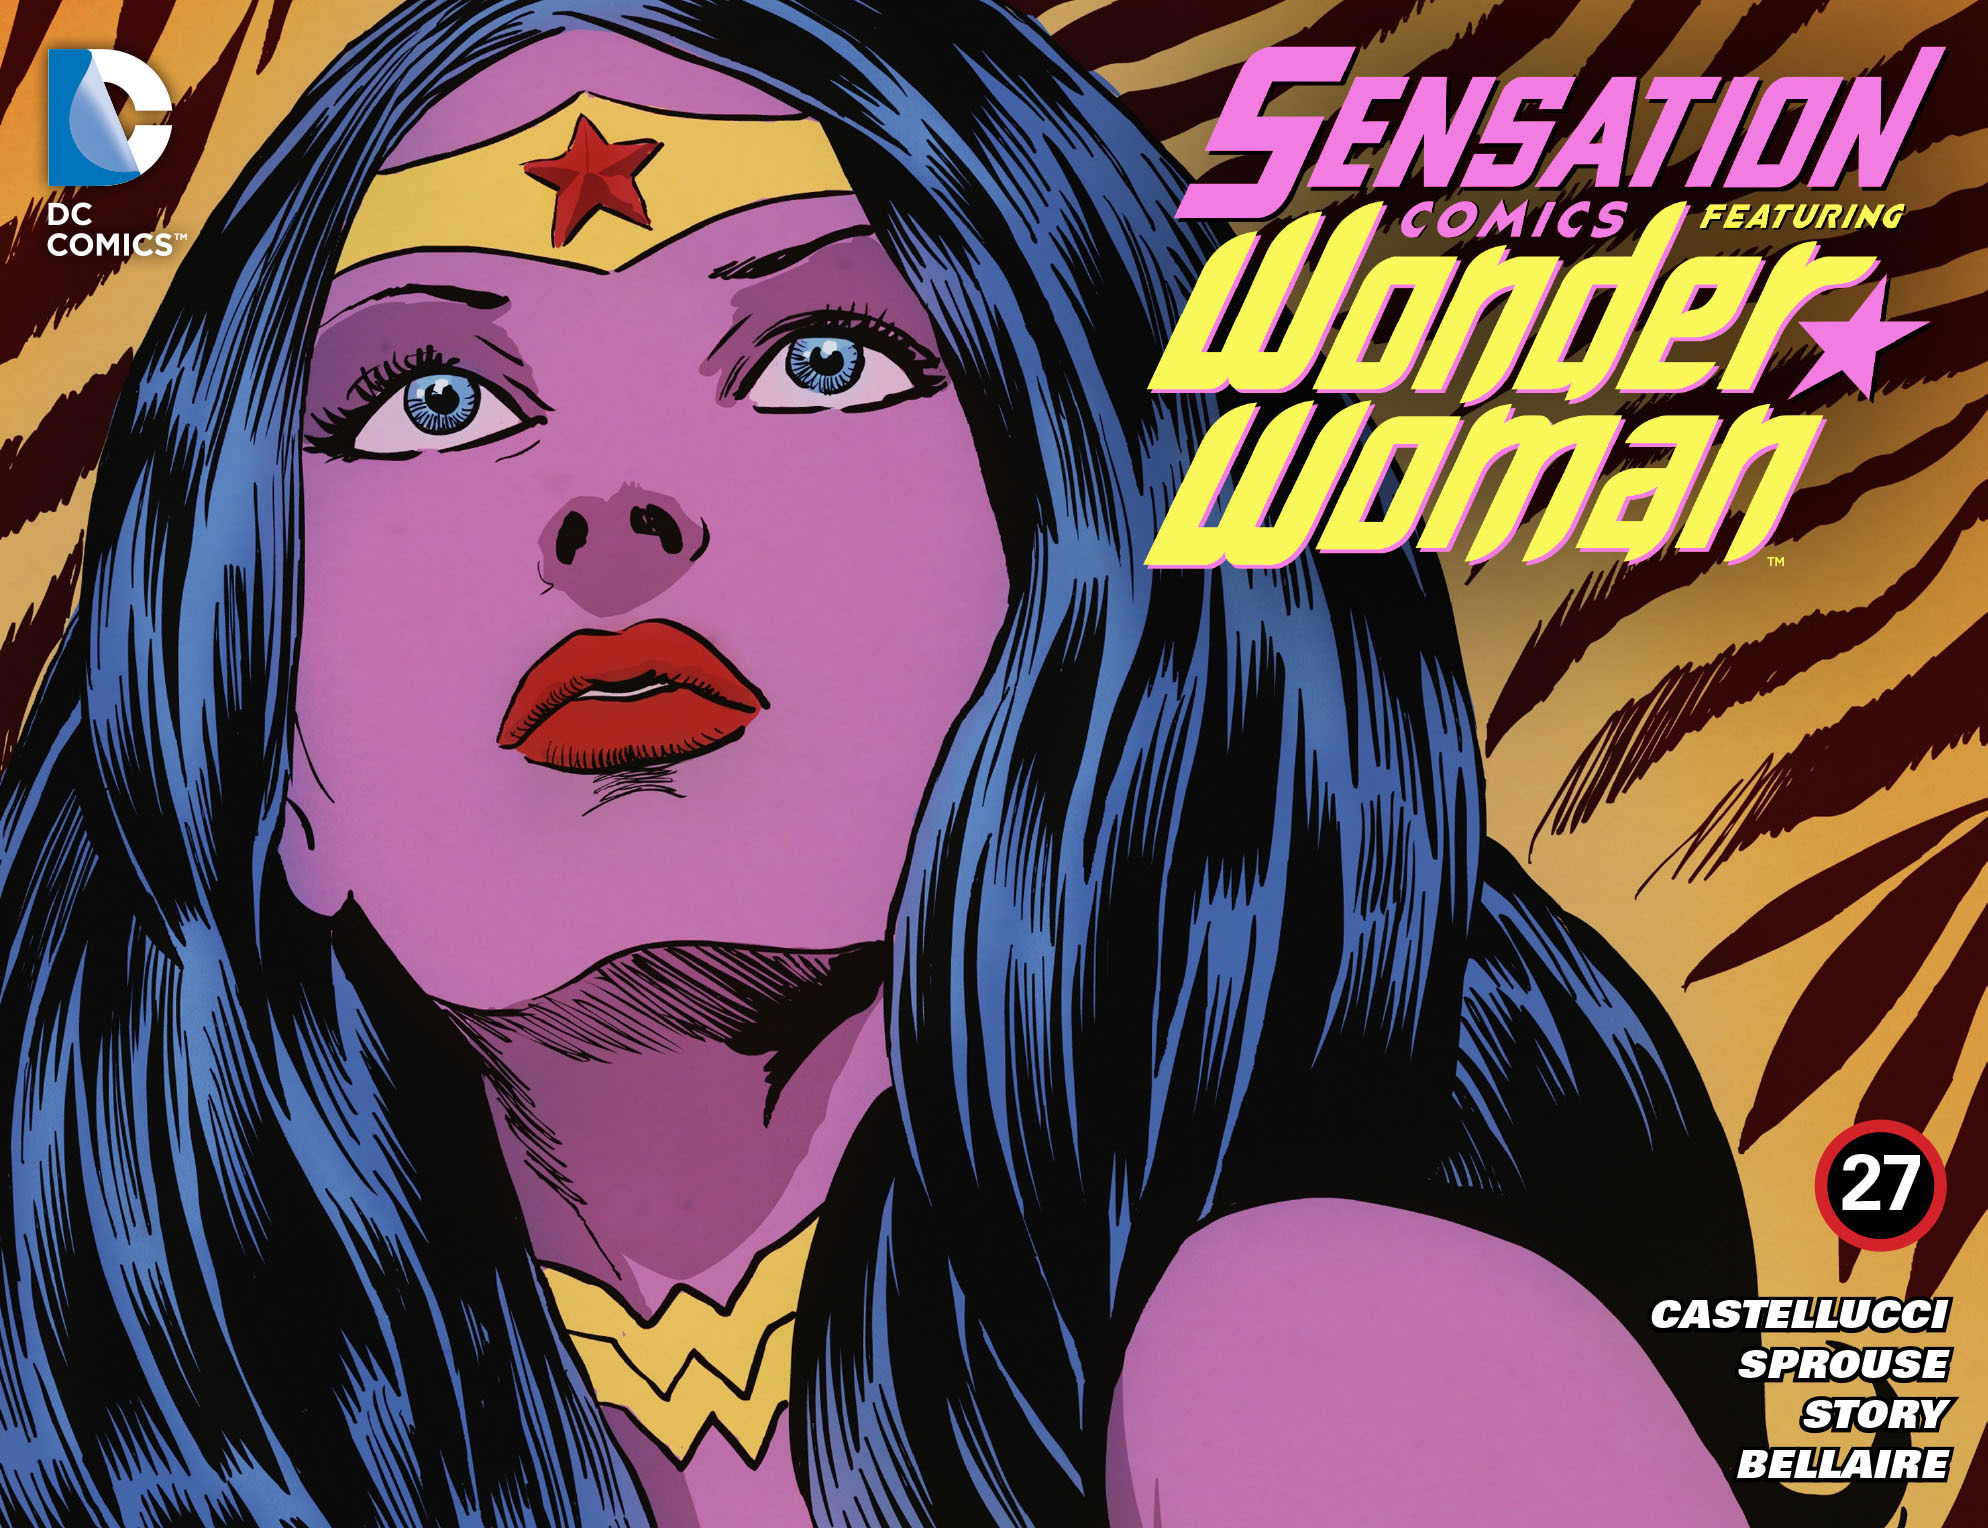 Read online Sensation Comics Featuring Wonder Woman comic -  Issue #27 - 1